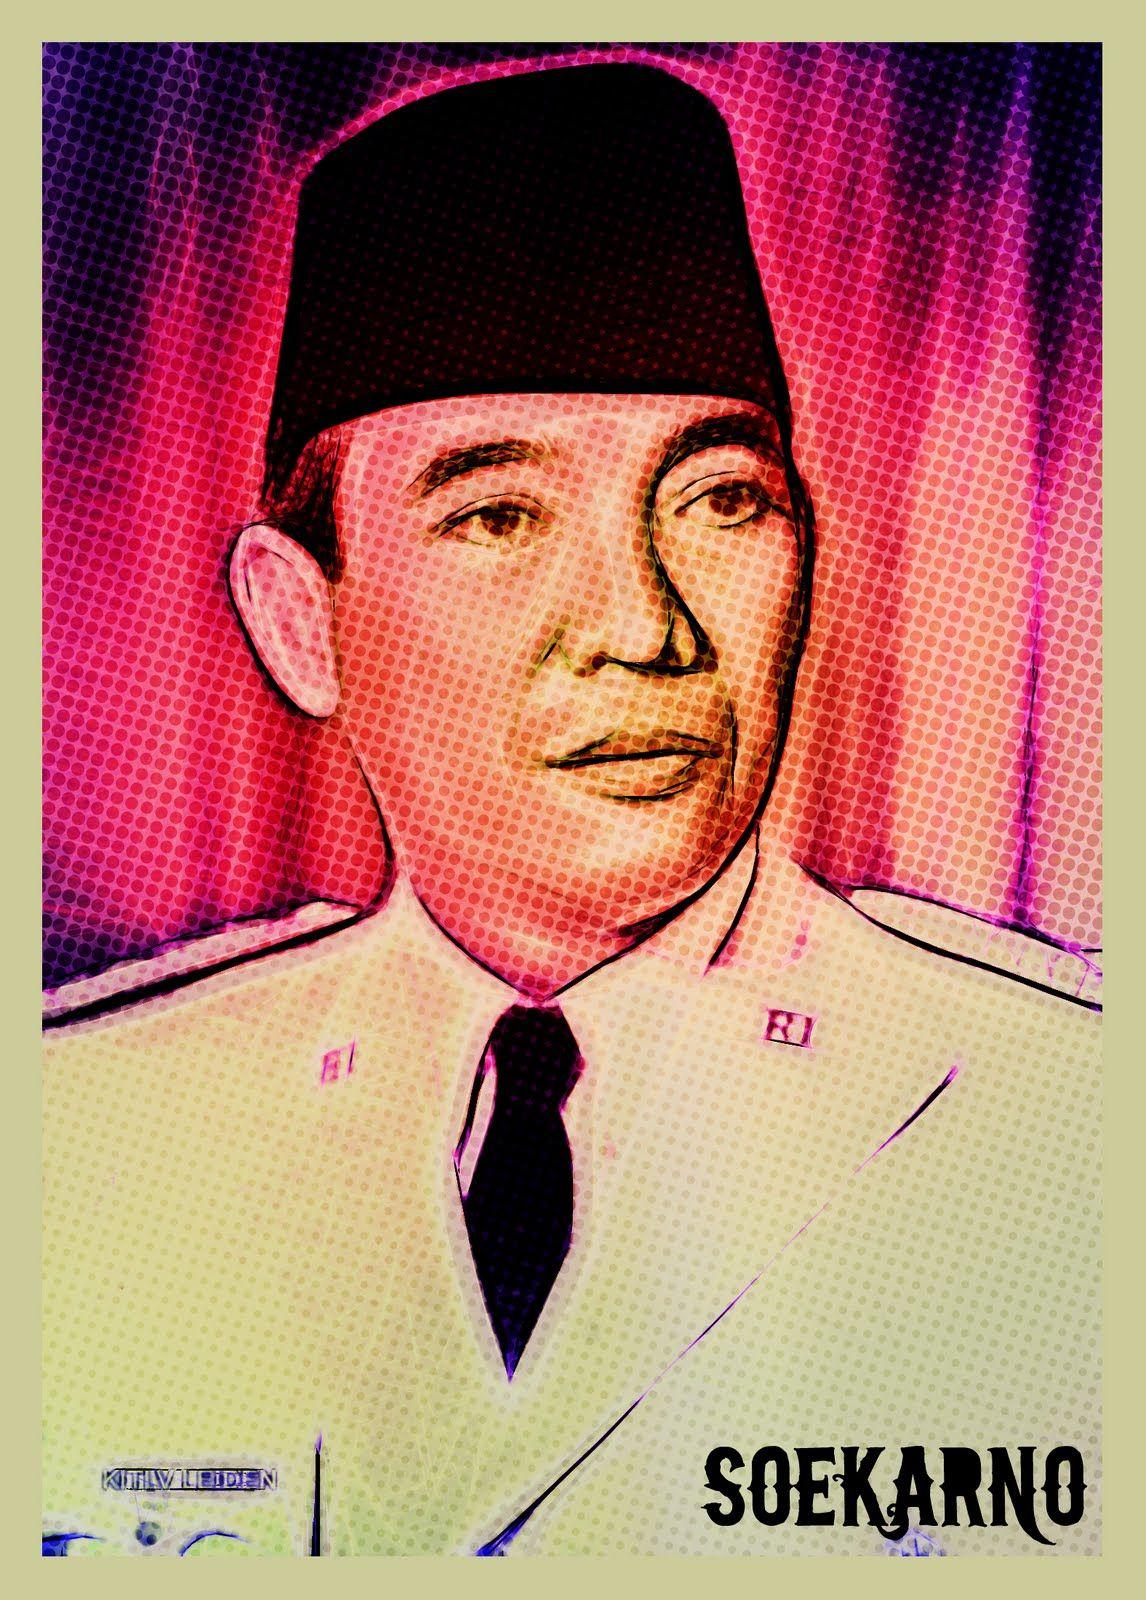 Wallpapers Soekarno Hd . 1594x1206 331571 soekarno